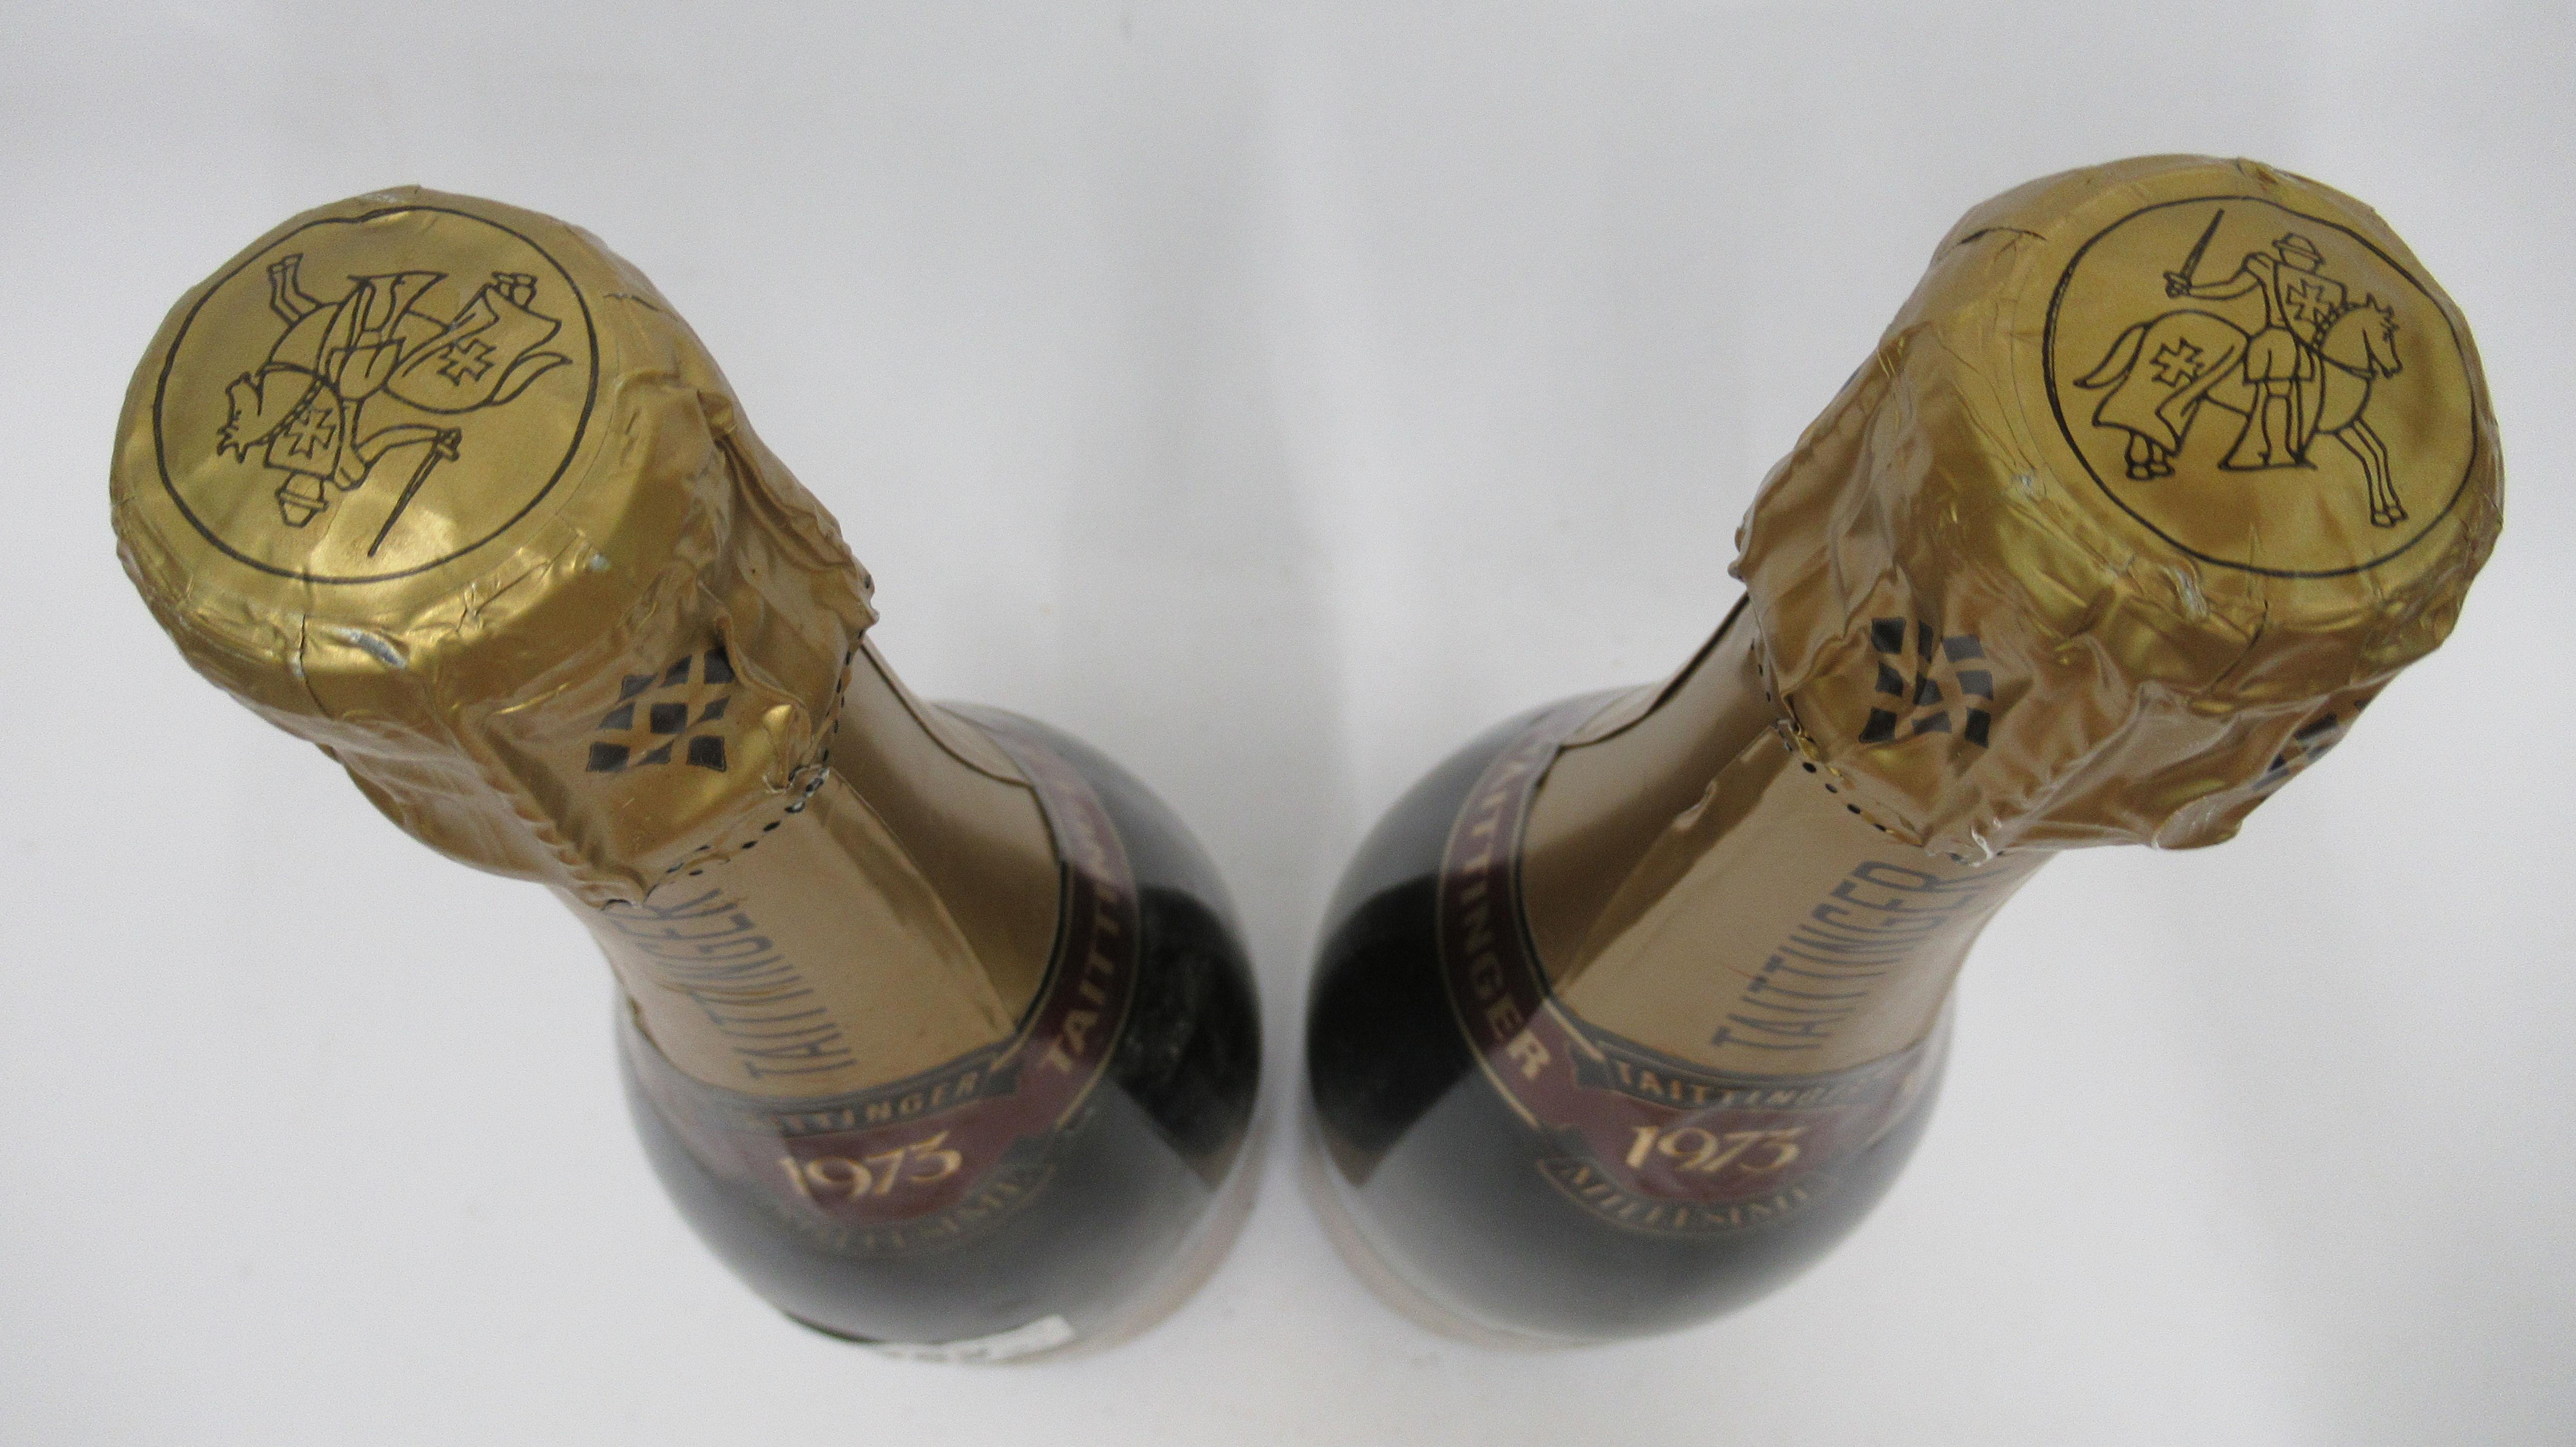 Wine, two bottles of 1973 Taittinger Millesime Champagne - Image 3 of 3